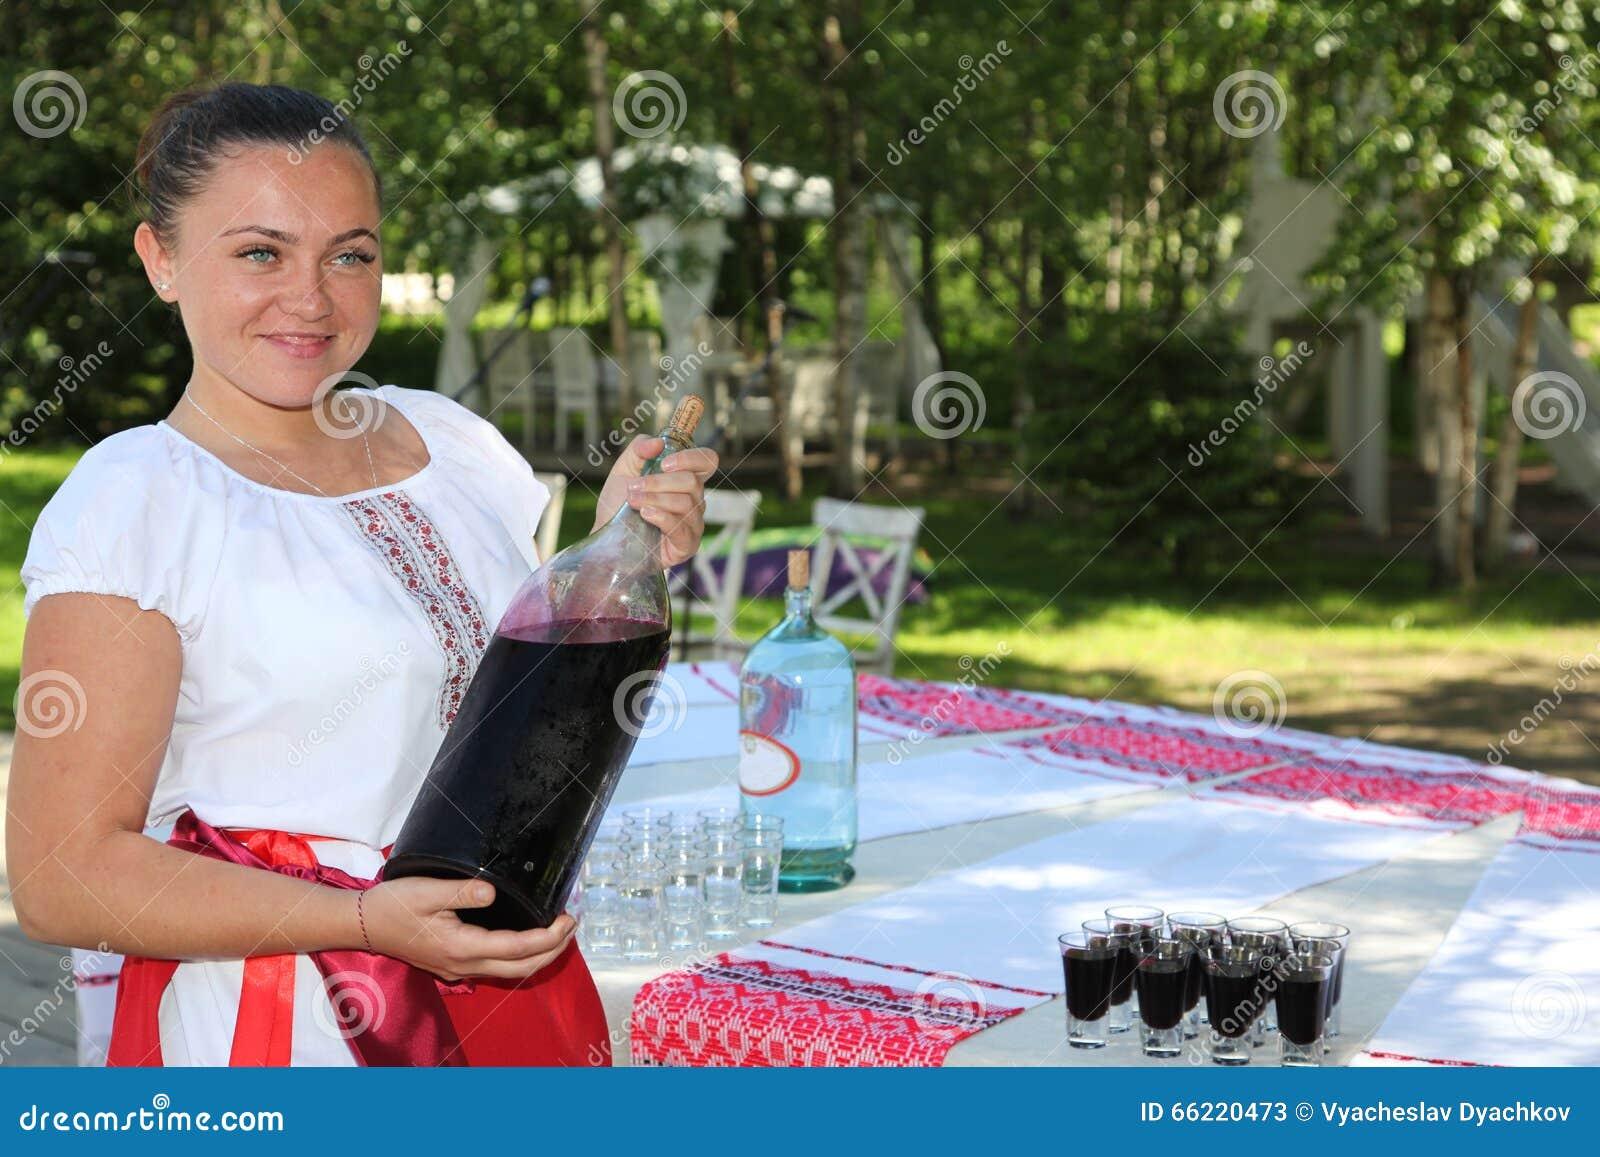 Presents beautiful ukrainian women from ideal